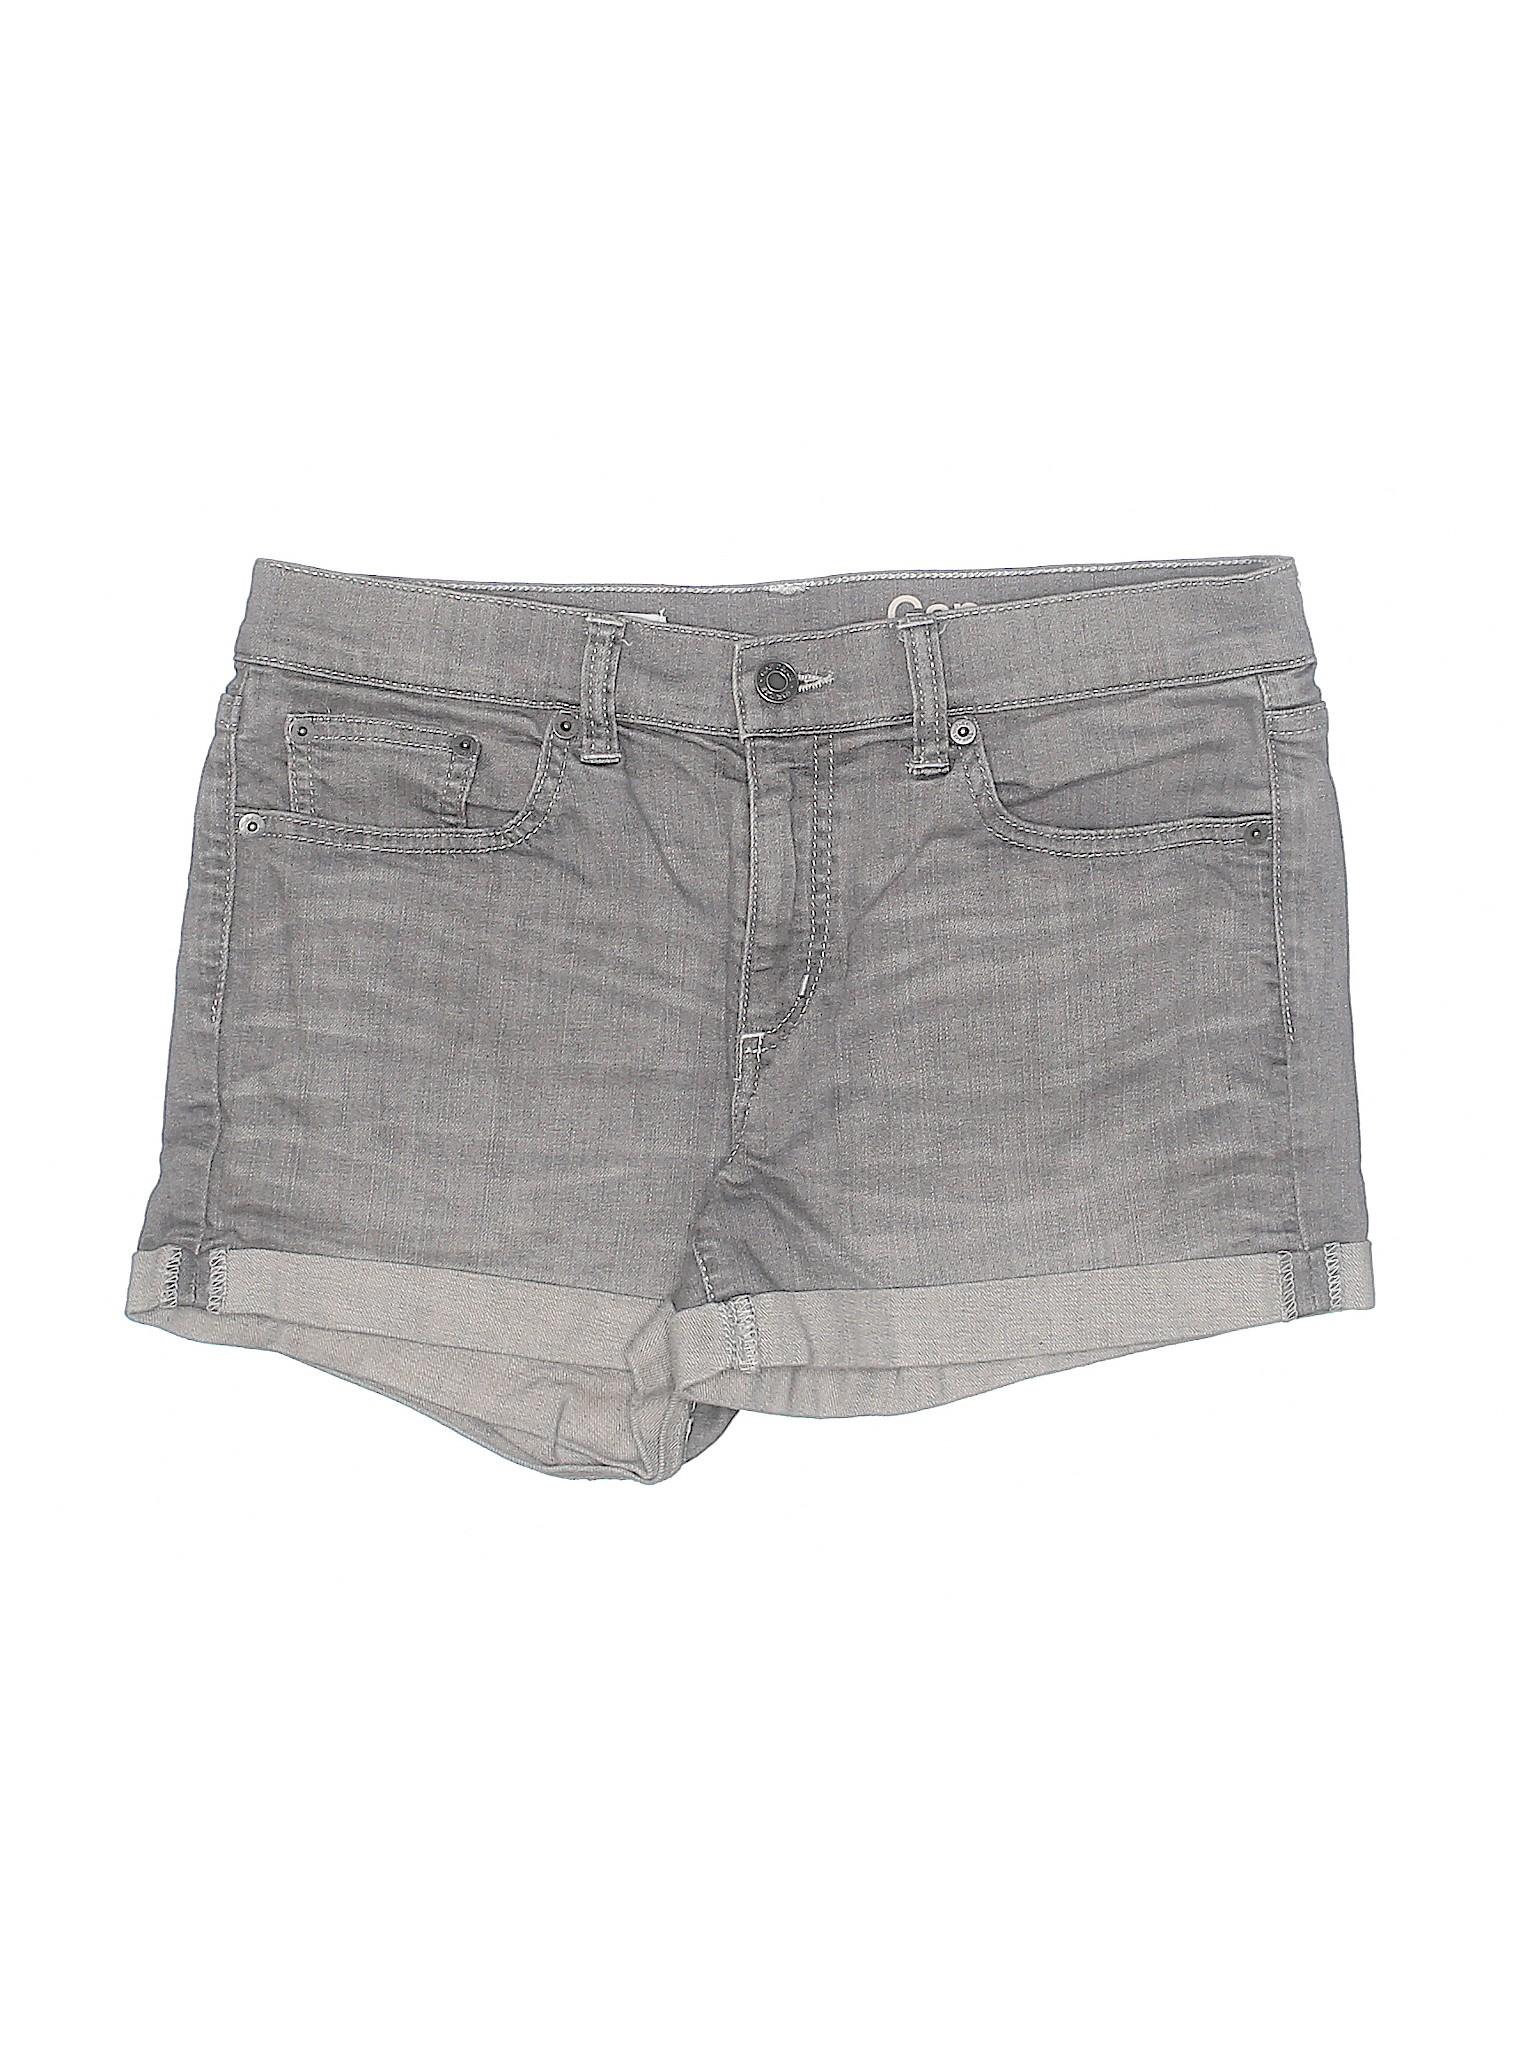 Shorts Boutique Boutique Gap Gap Denim wXg7pqpO